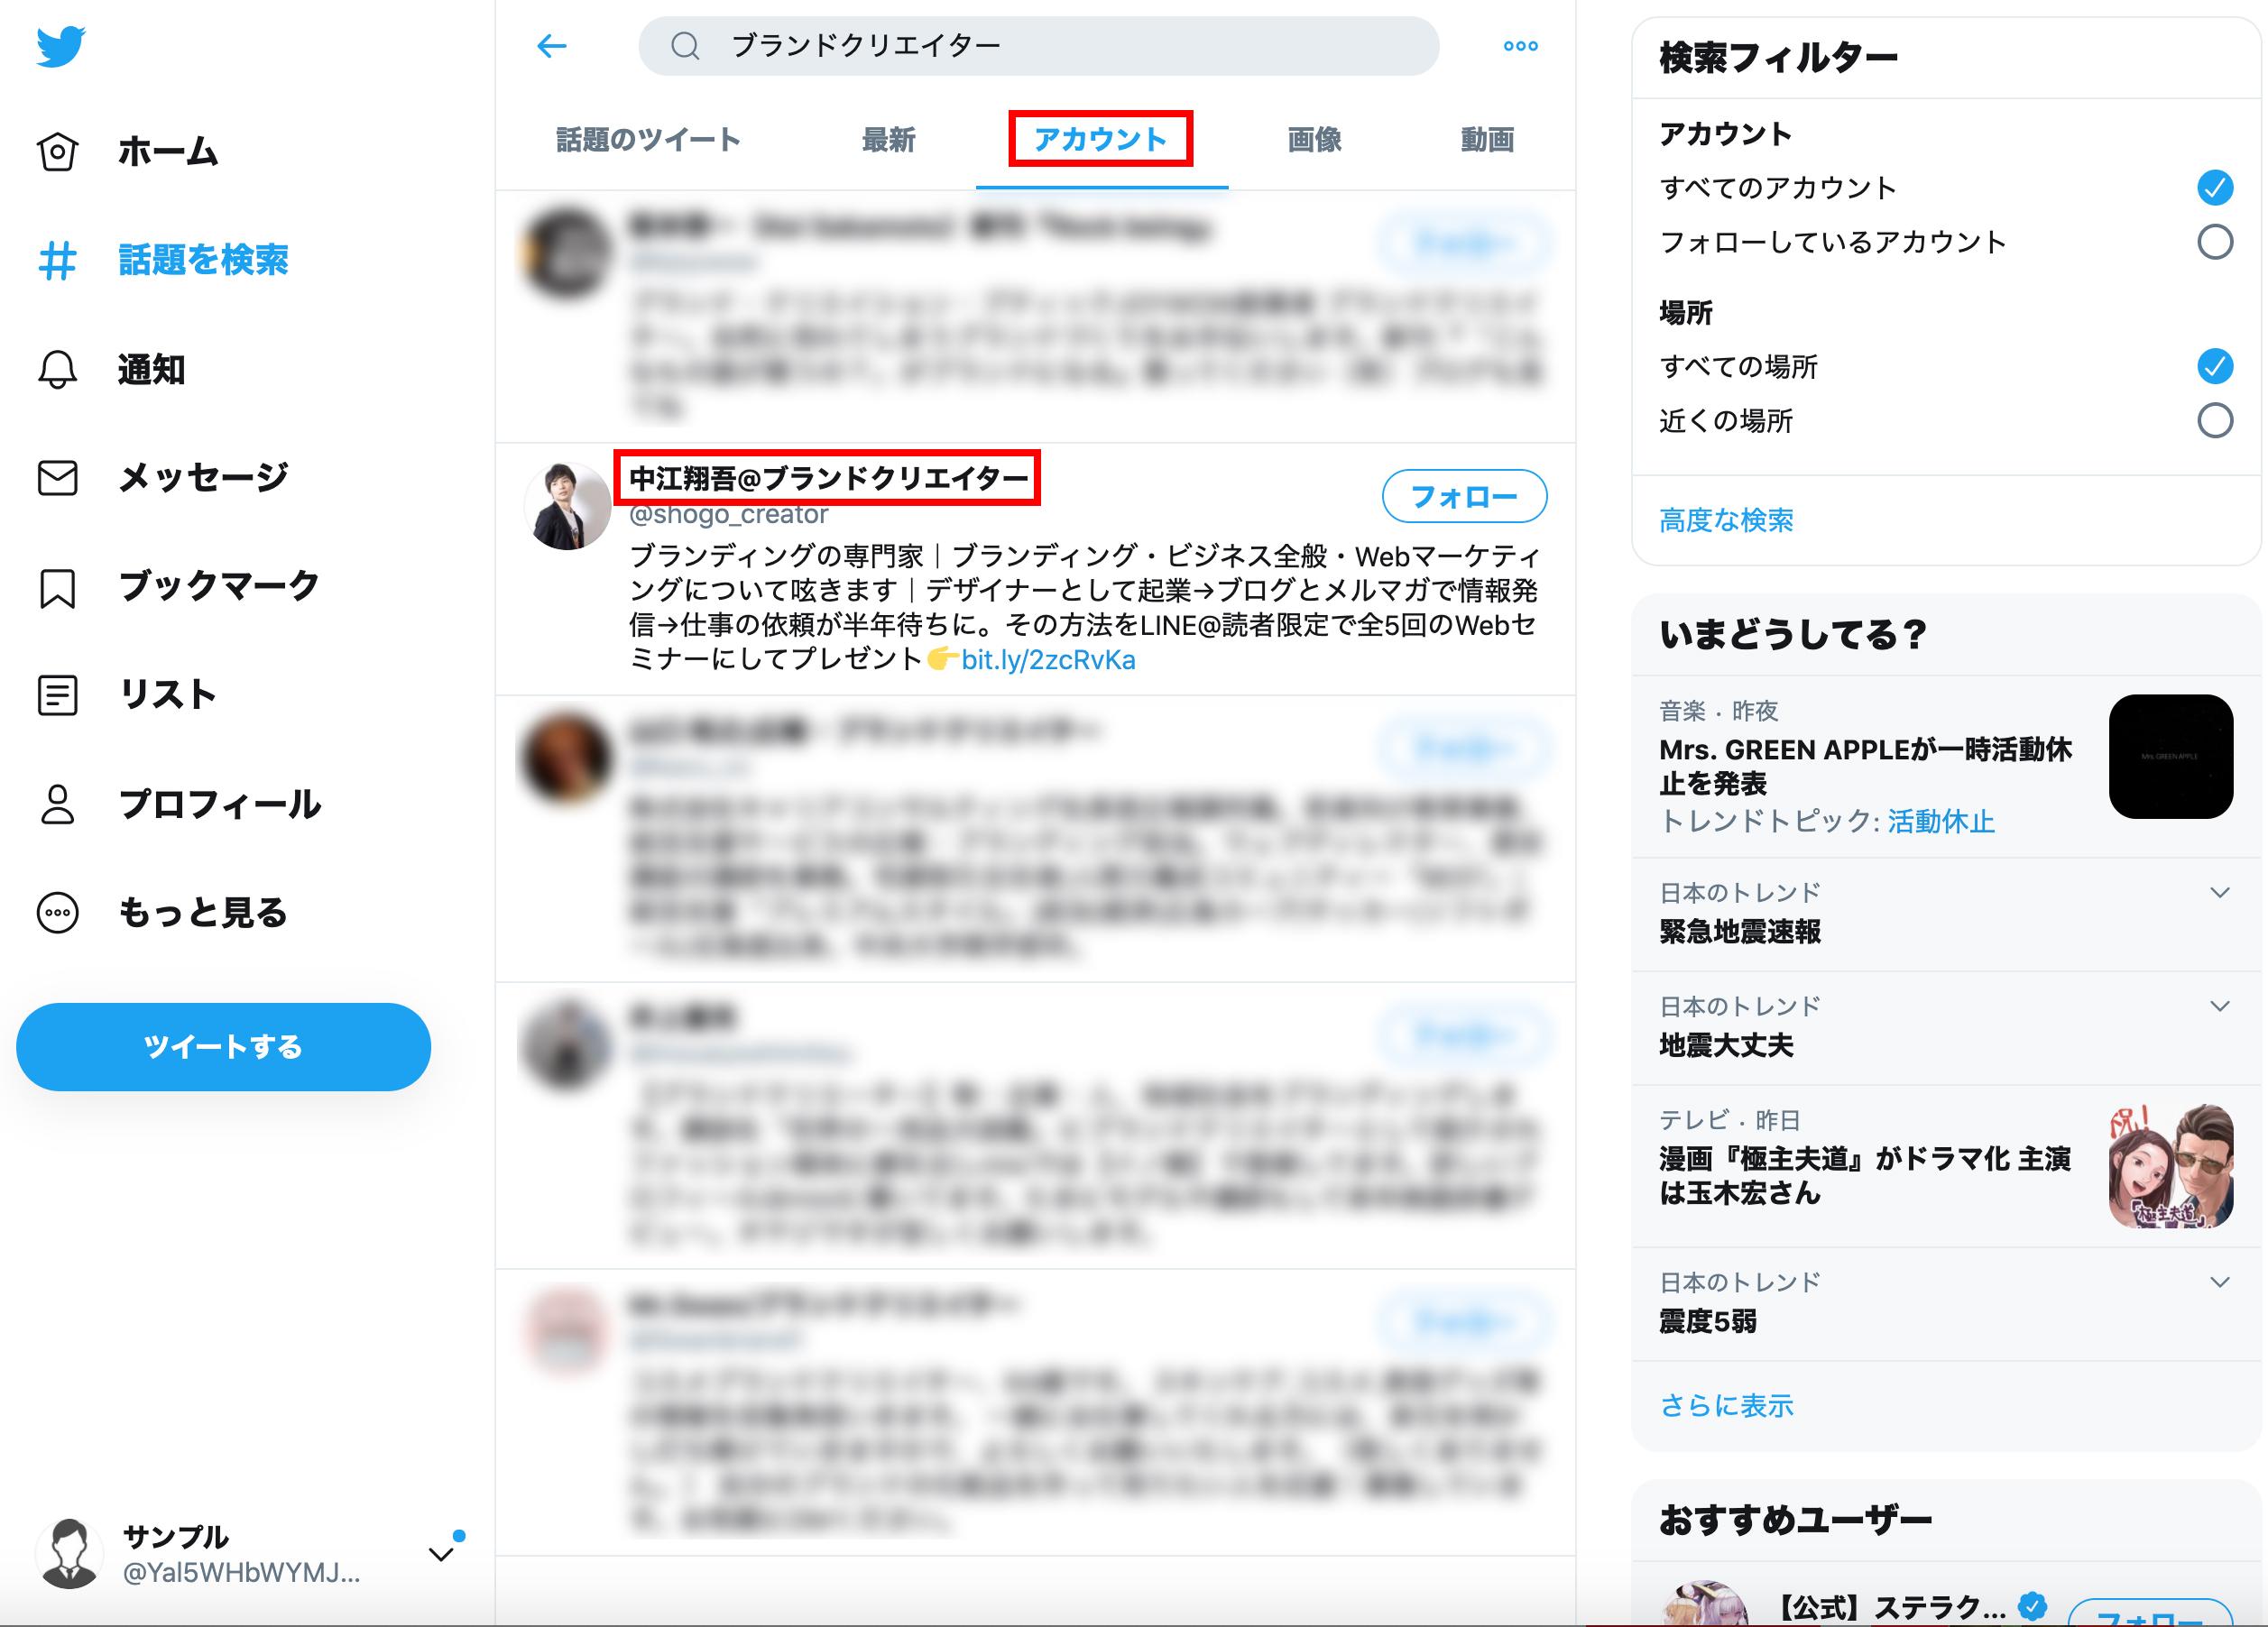 Twitterの検索結果